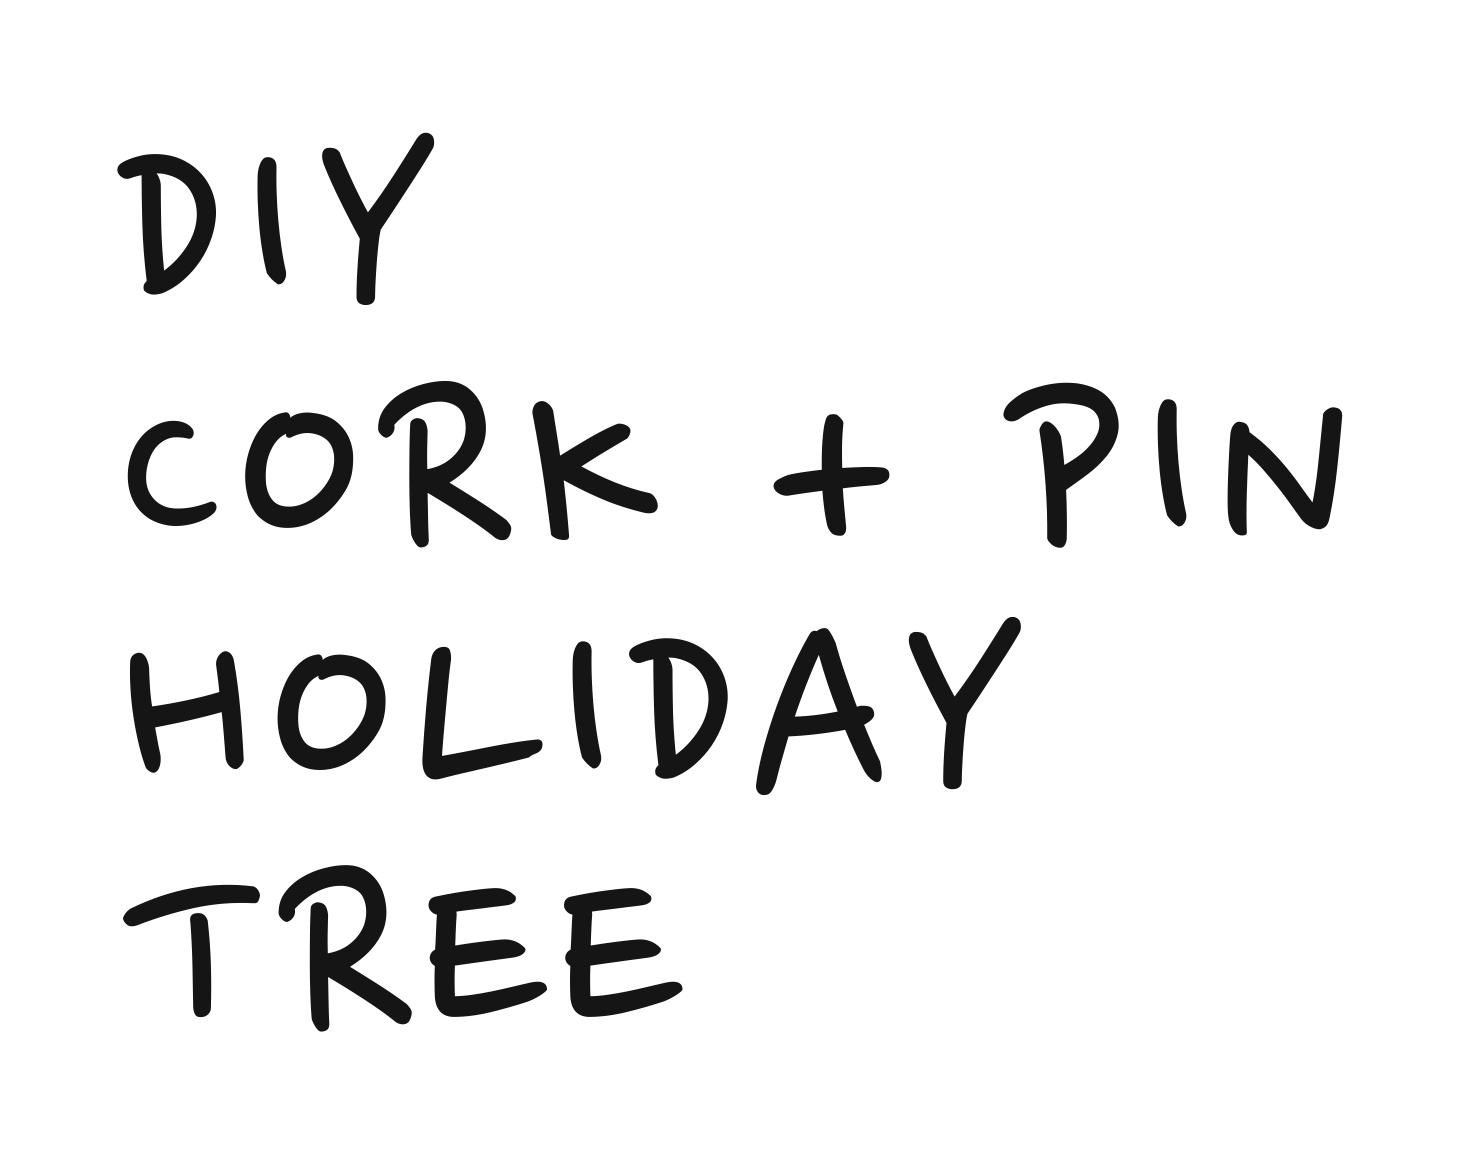 CorkPinHolidayTreeBlock.png